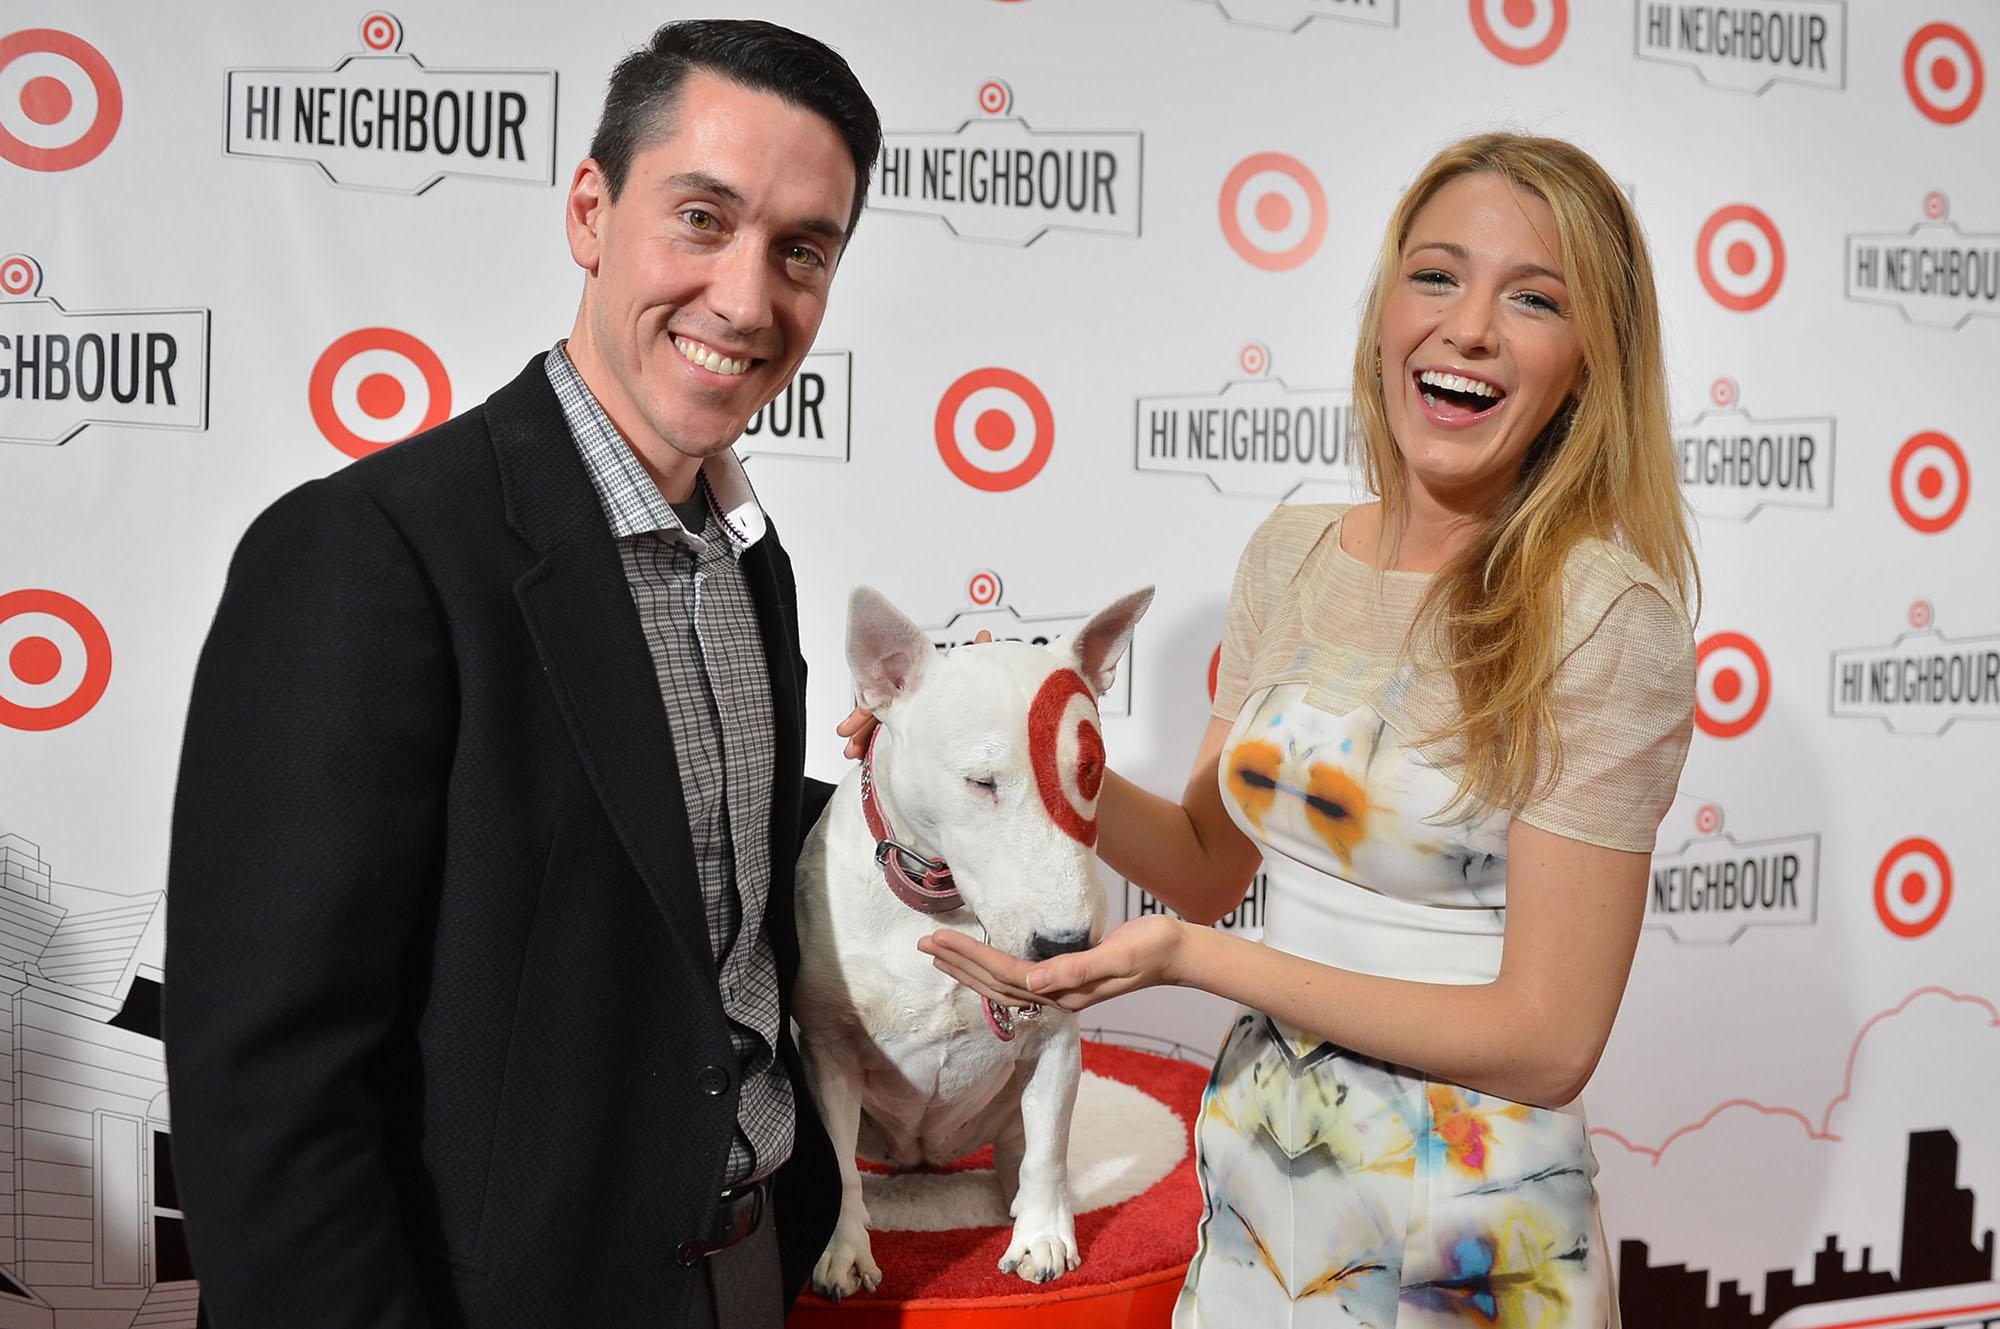 Tony Fisher, president, Target Canada, Bullseye Target's bull terrier mascot, Blake Lively | Photo: CNW Group/Target Canada